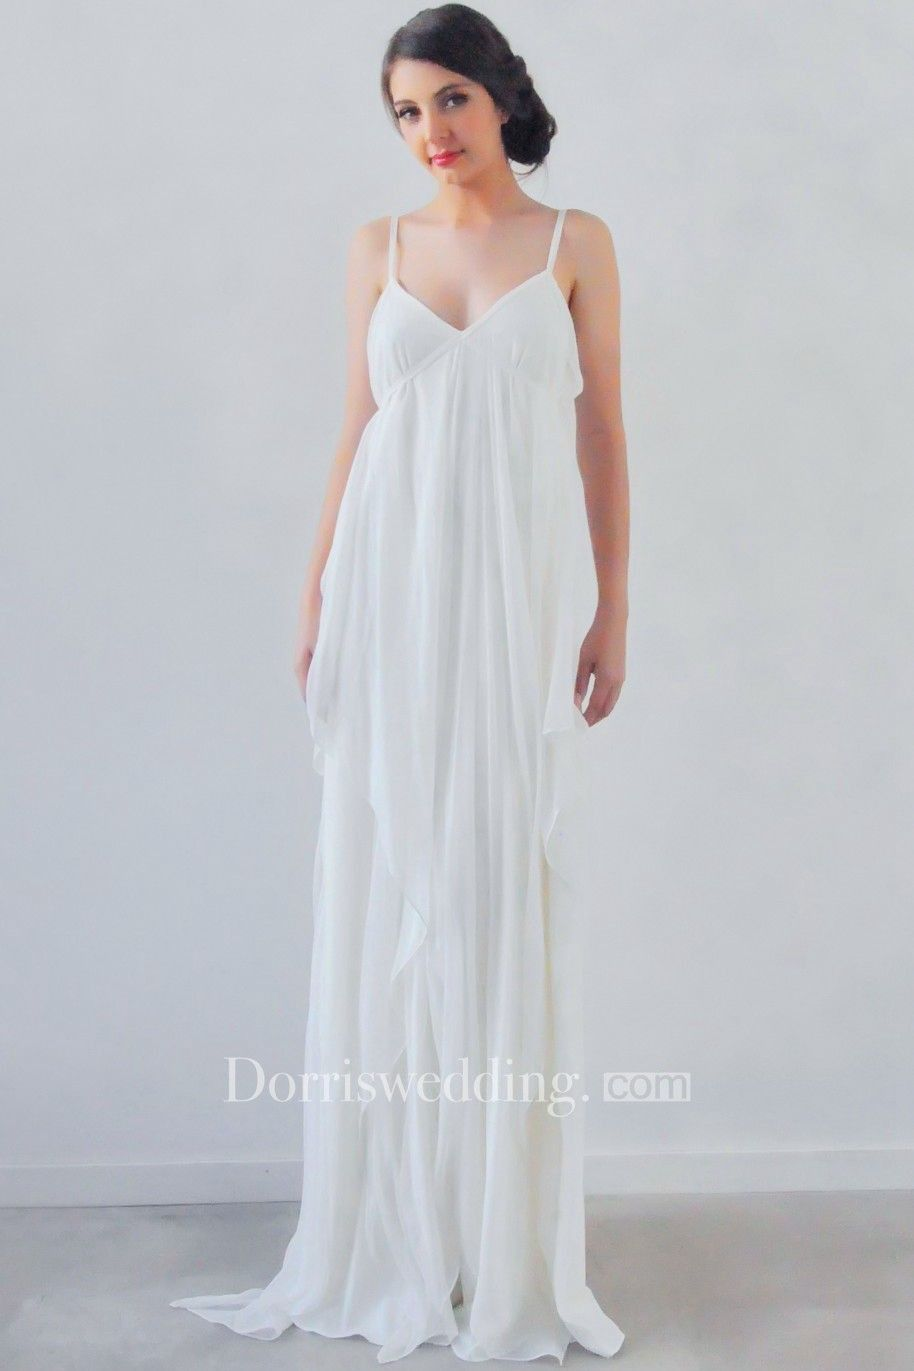 Sheath spaghetti sleeveless empire draped chiffon wedding dress